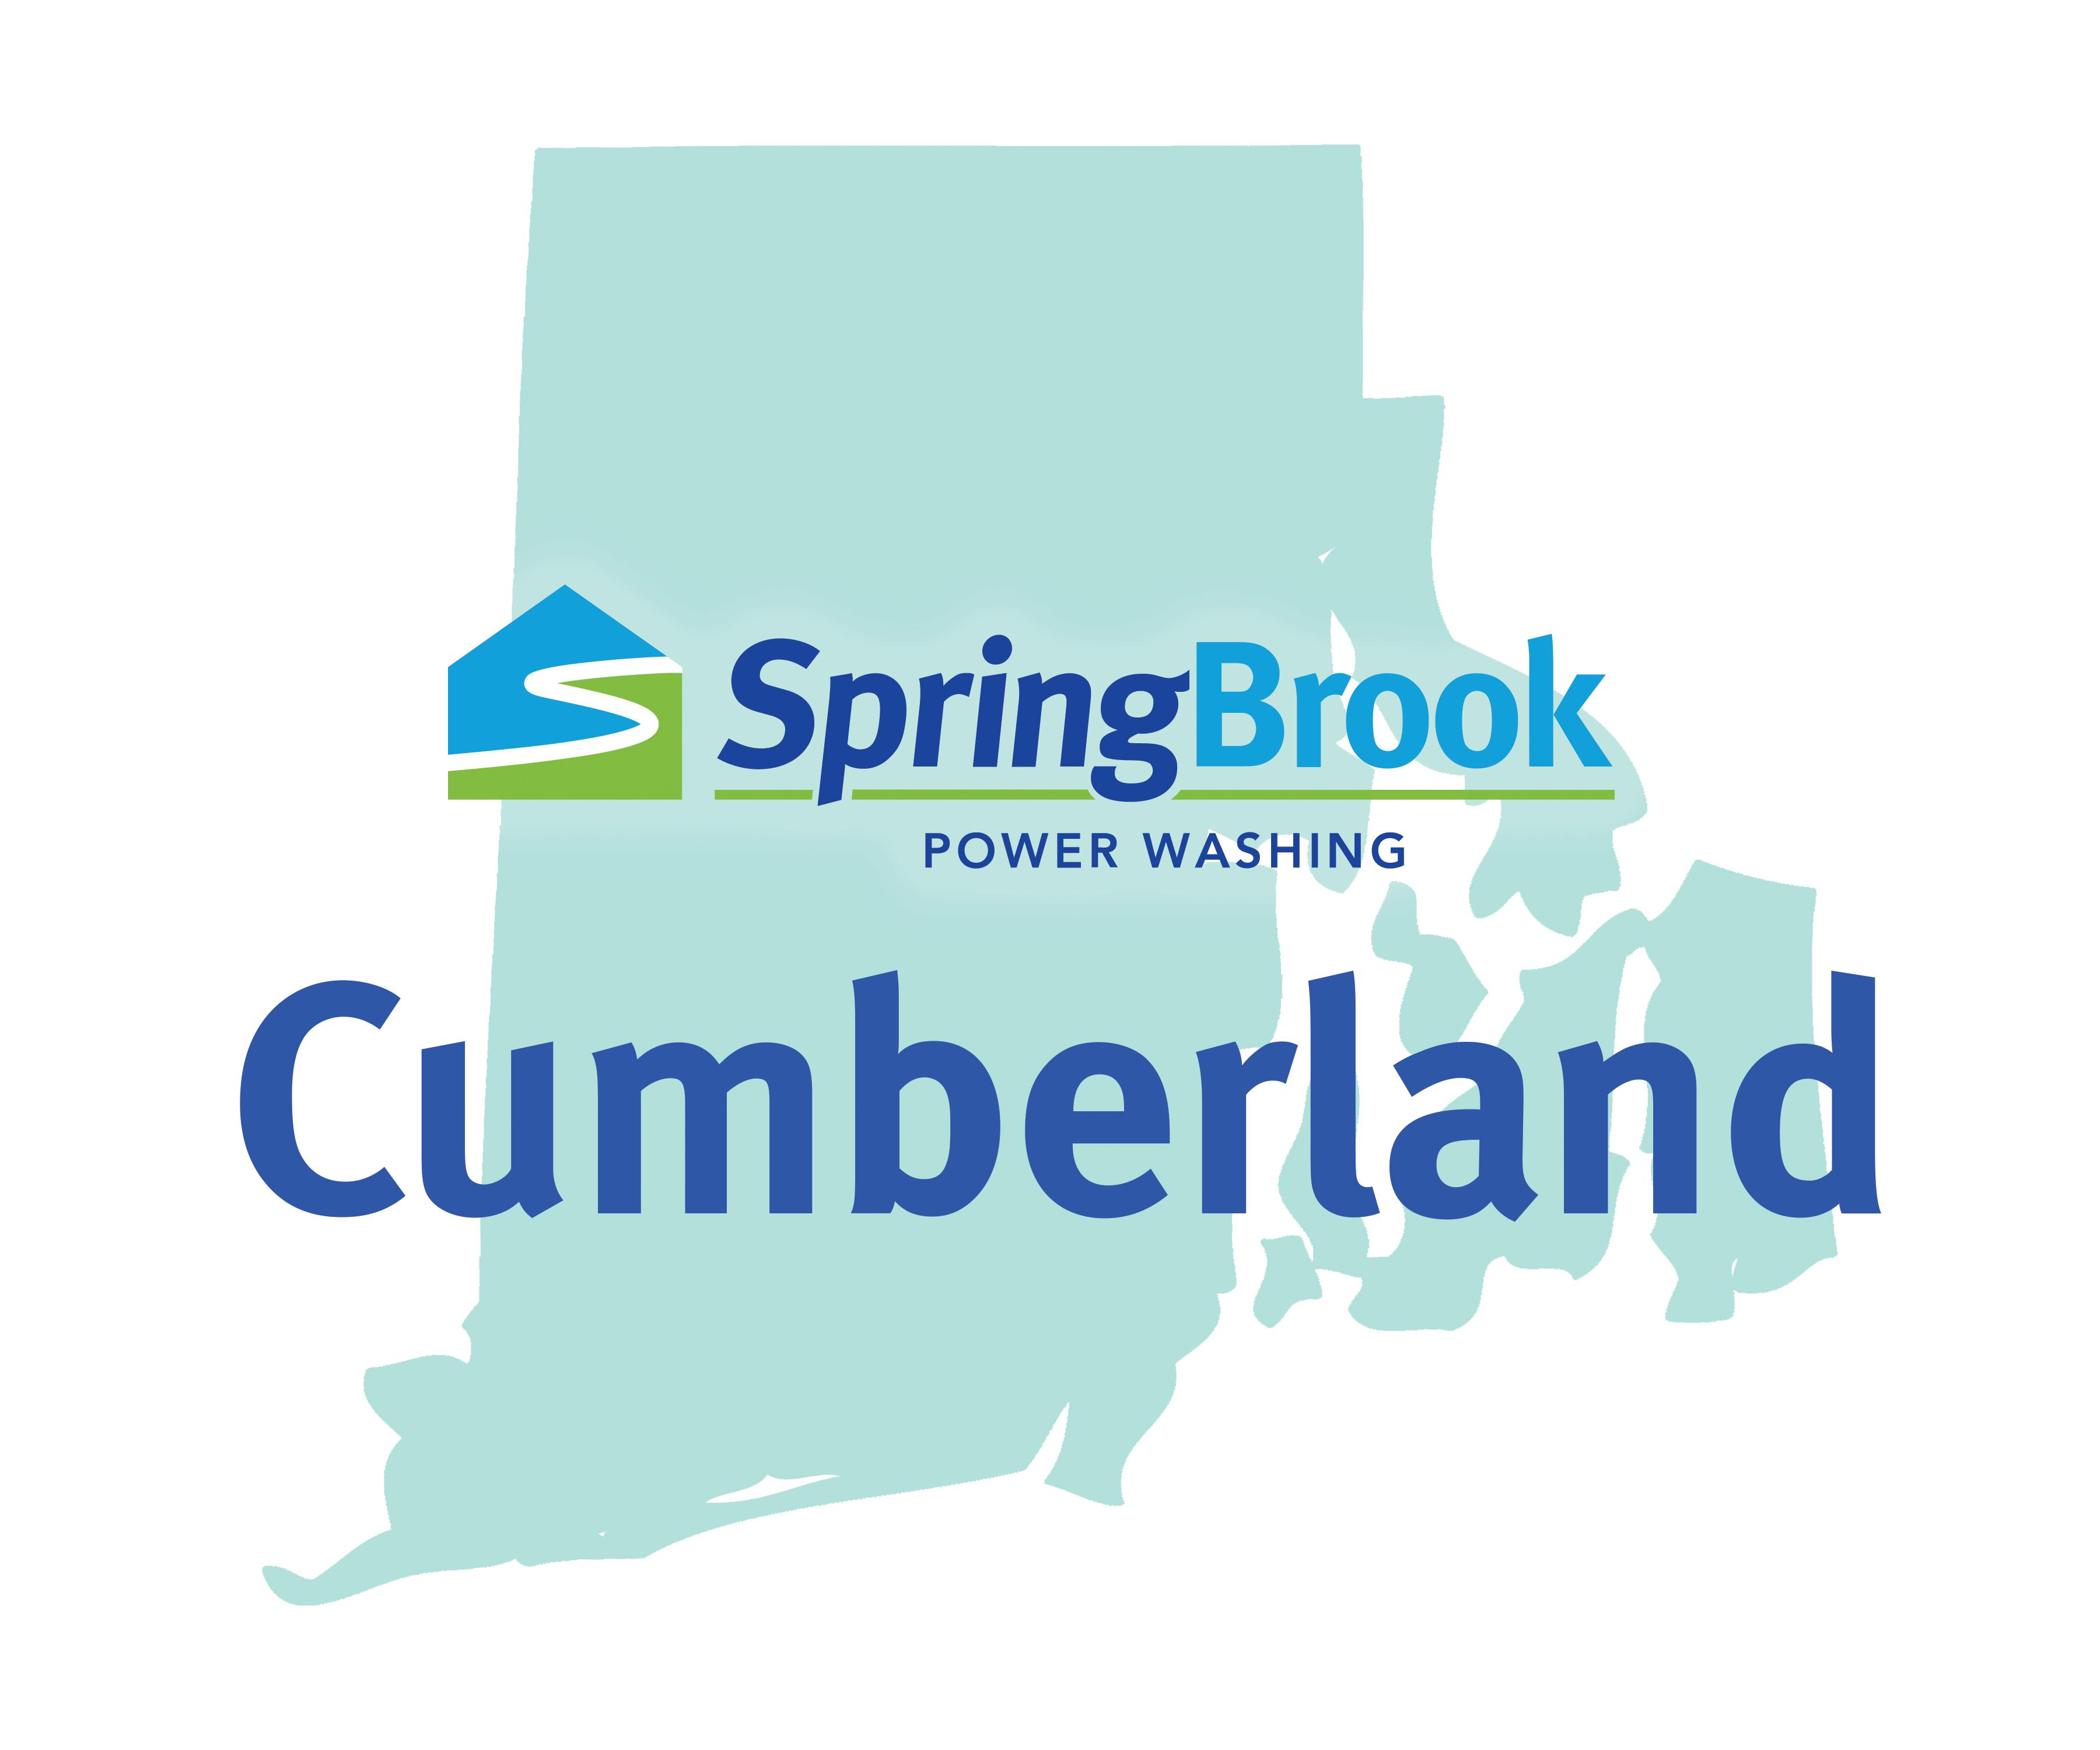 Springbrook Power Washing Cumberland Rhode Island